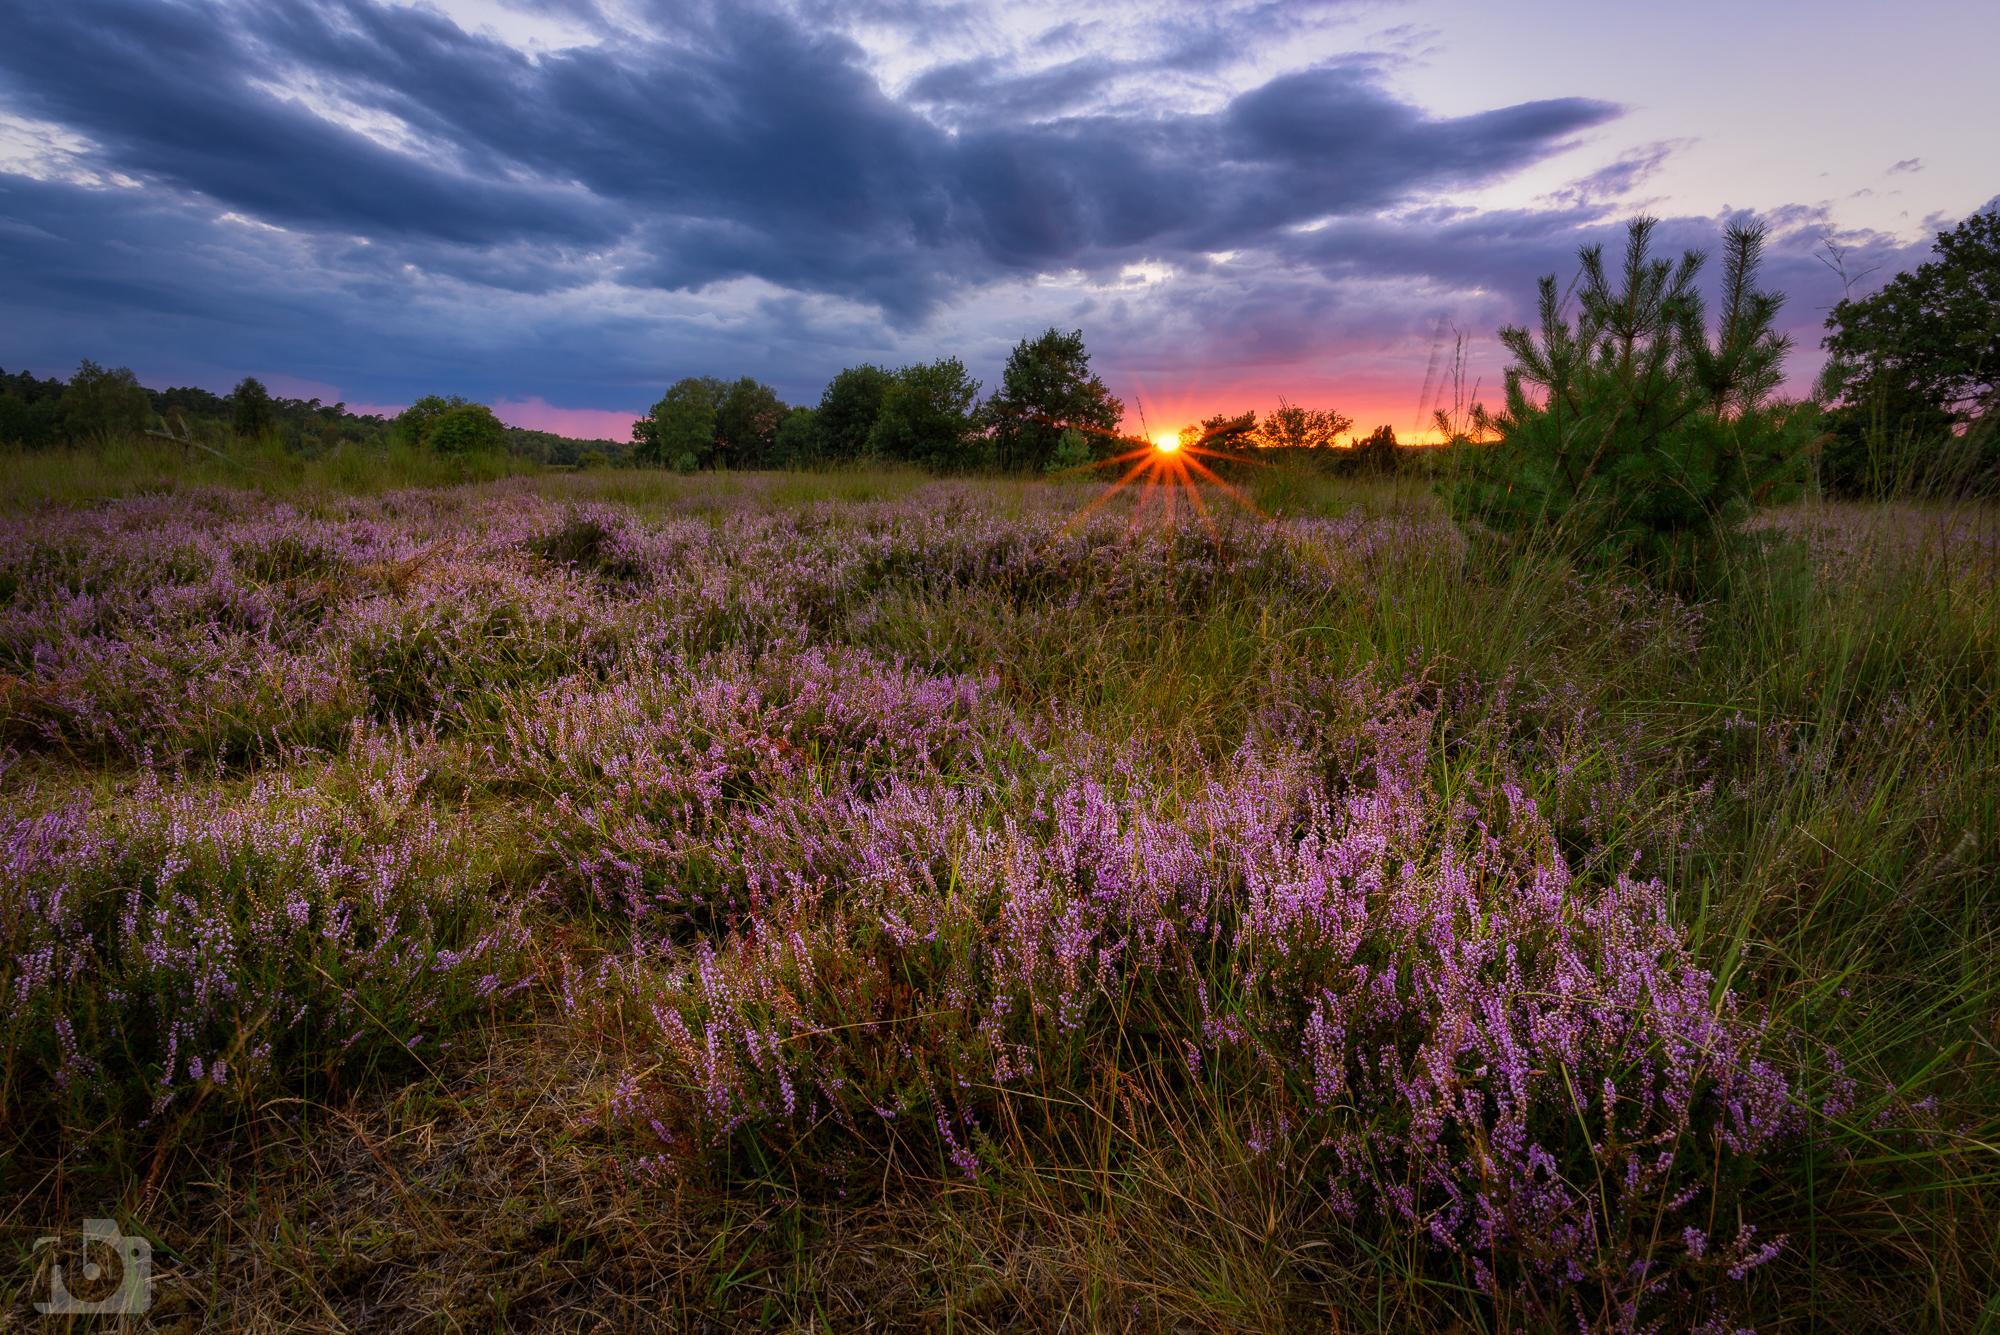 Elmptaler Heide (elmptaler heath), Germany